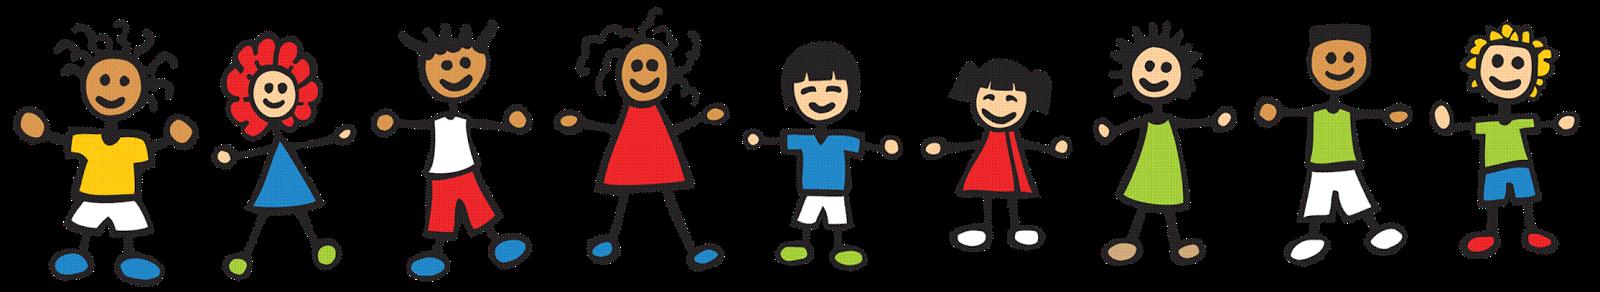 1600x292 Kids Holding Hands Clipart